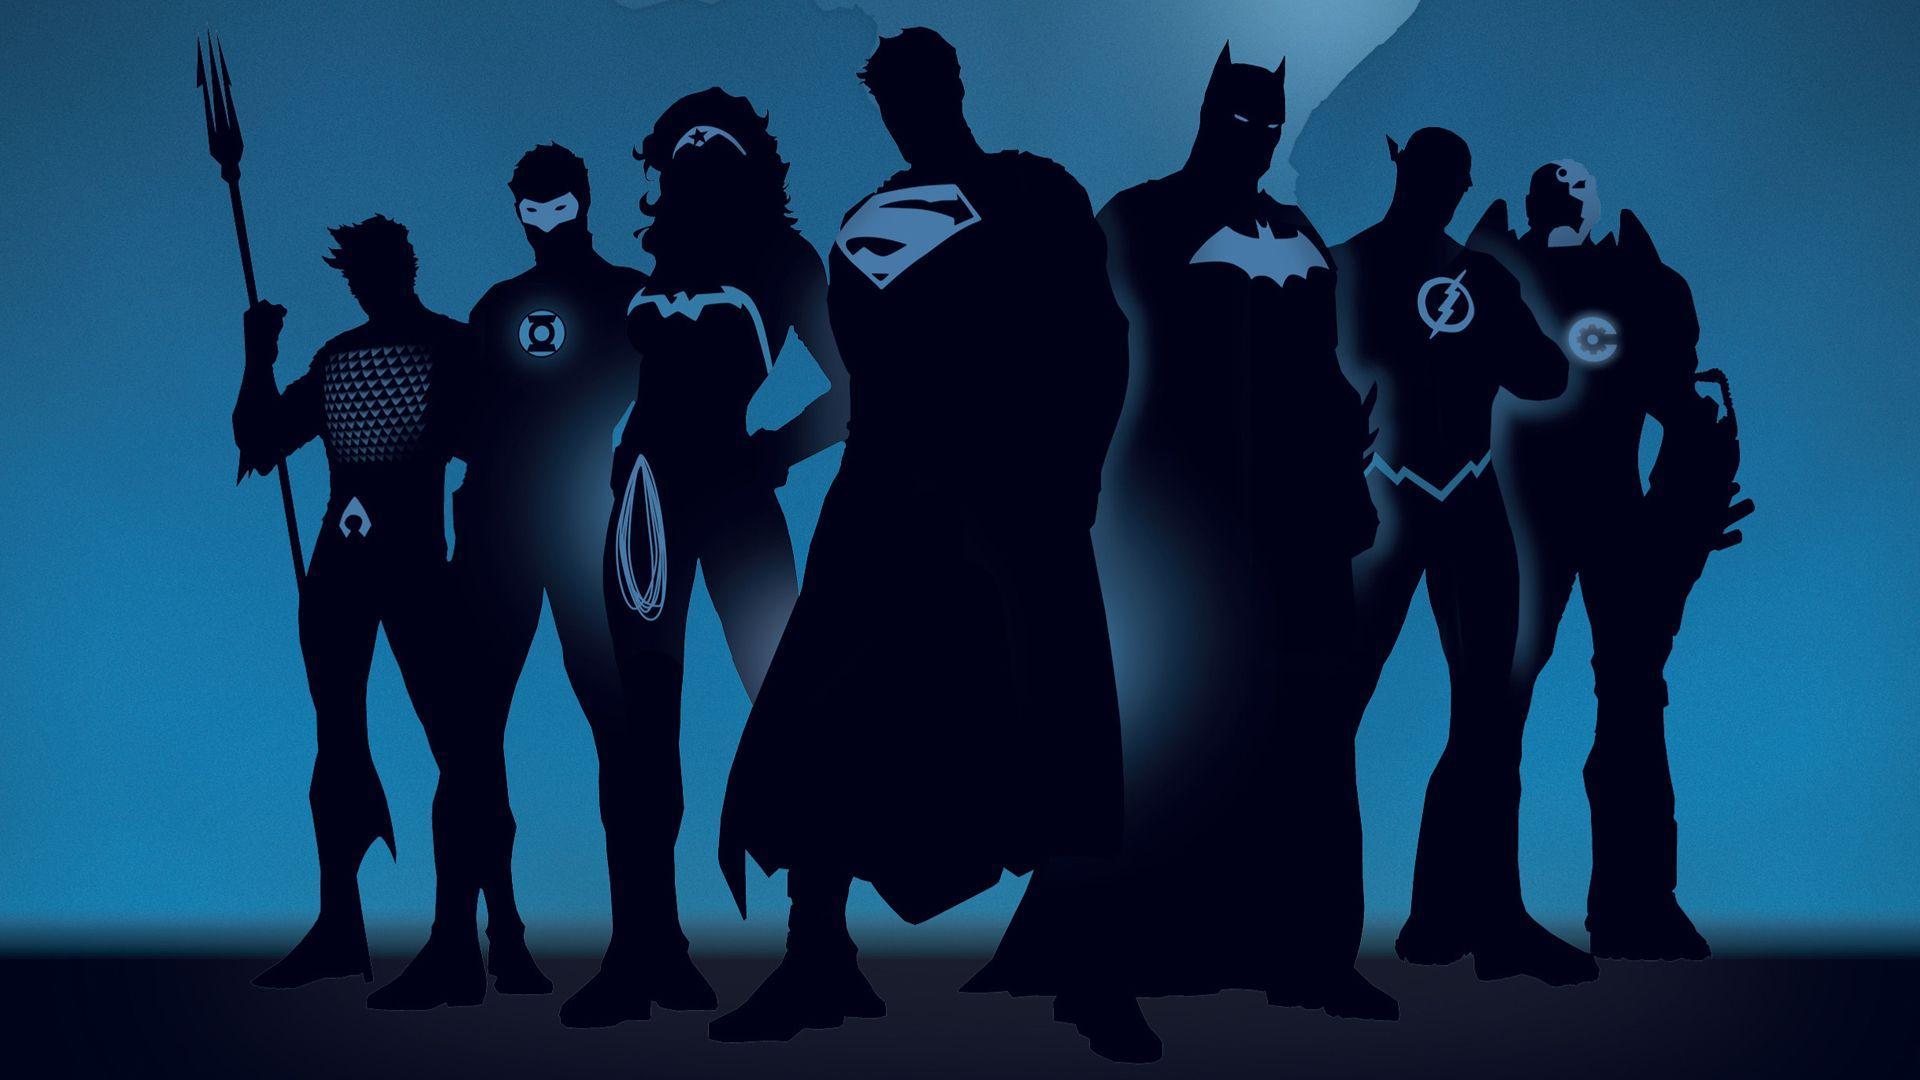 Super Heroes Wallpapers - Wallpaper Cave